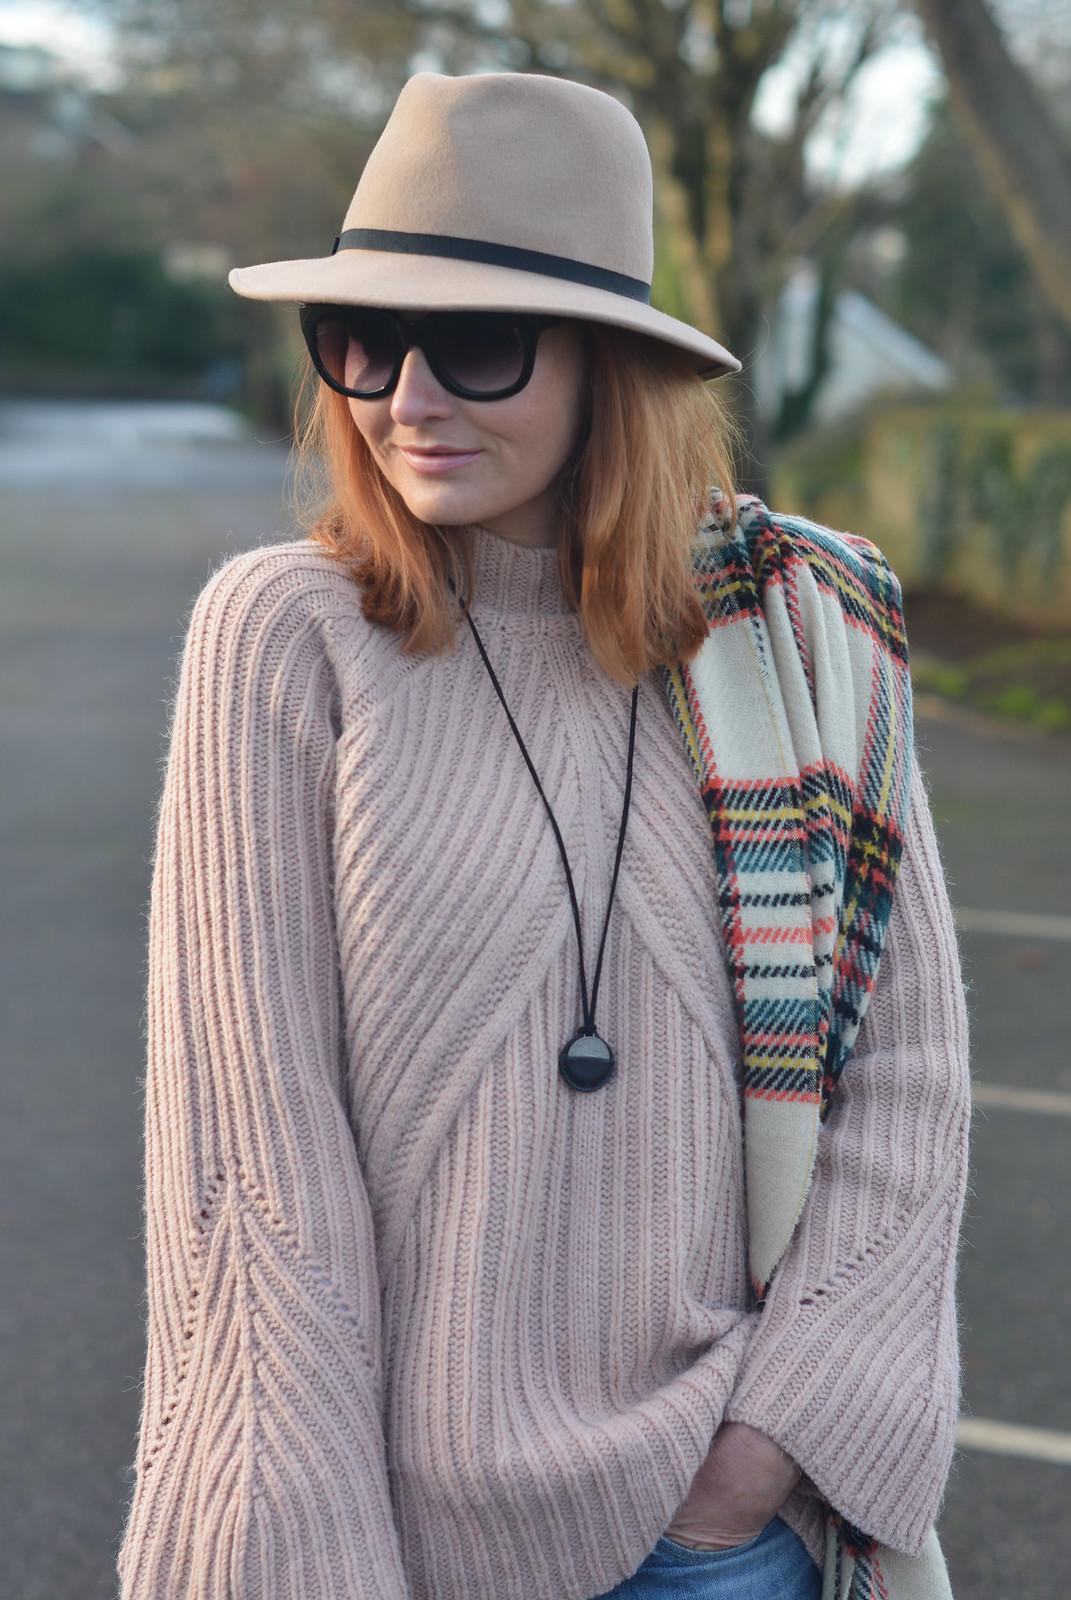 Blush Knitwear, Felt Fedora, Tartan Scarf, Long Coin Pendant